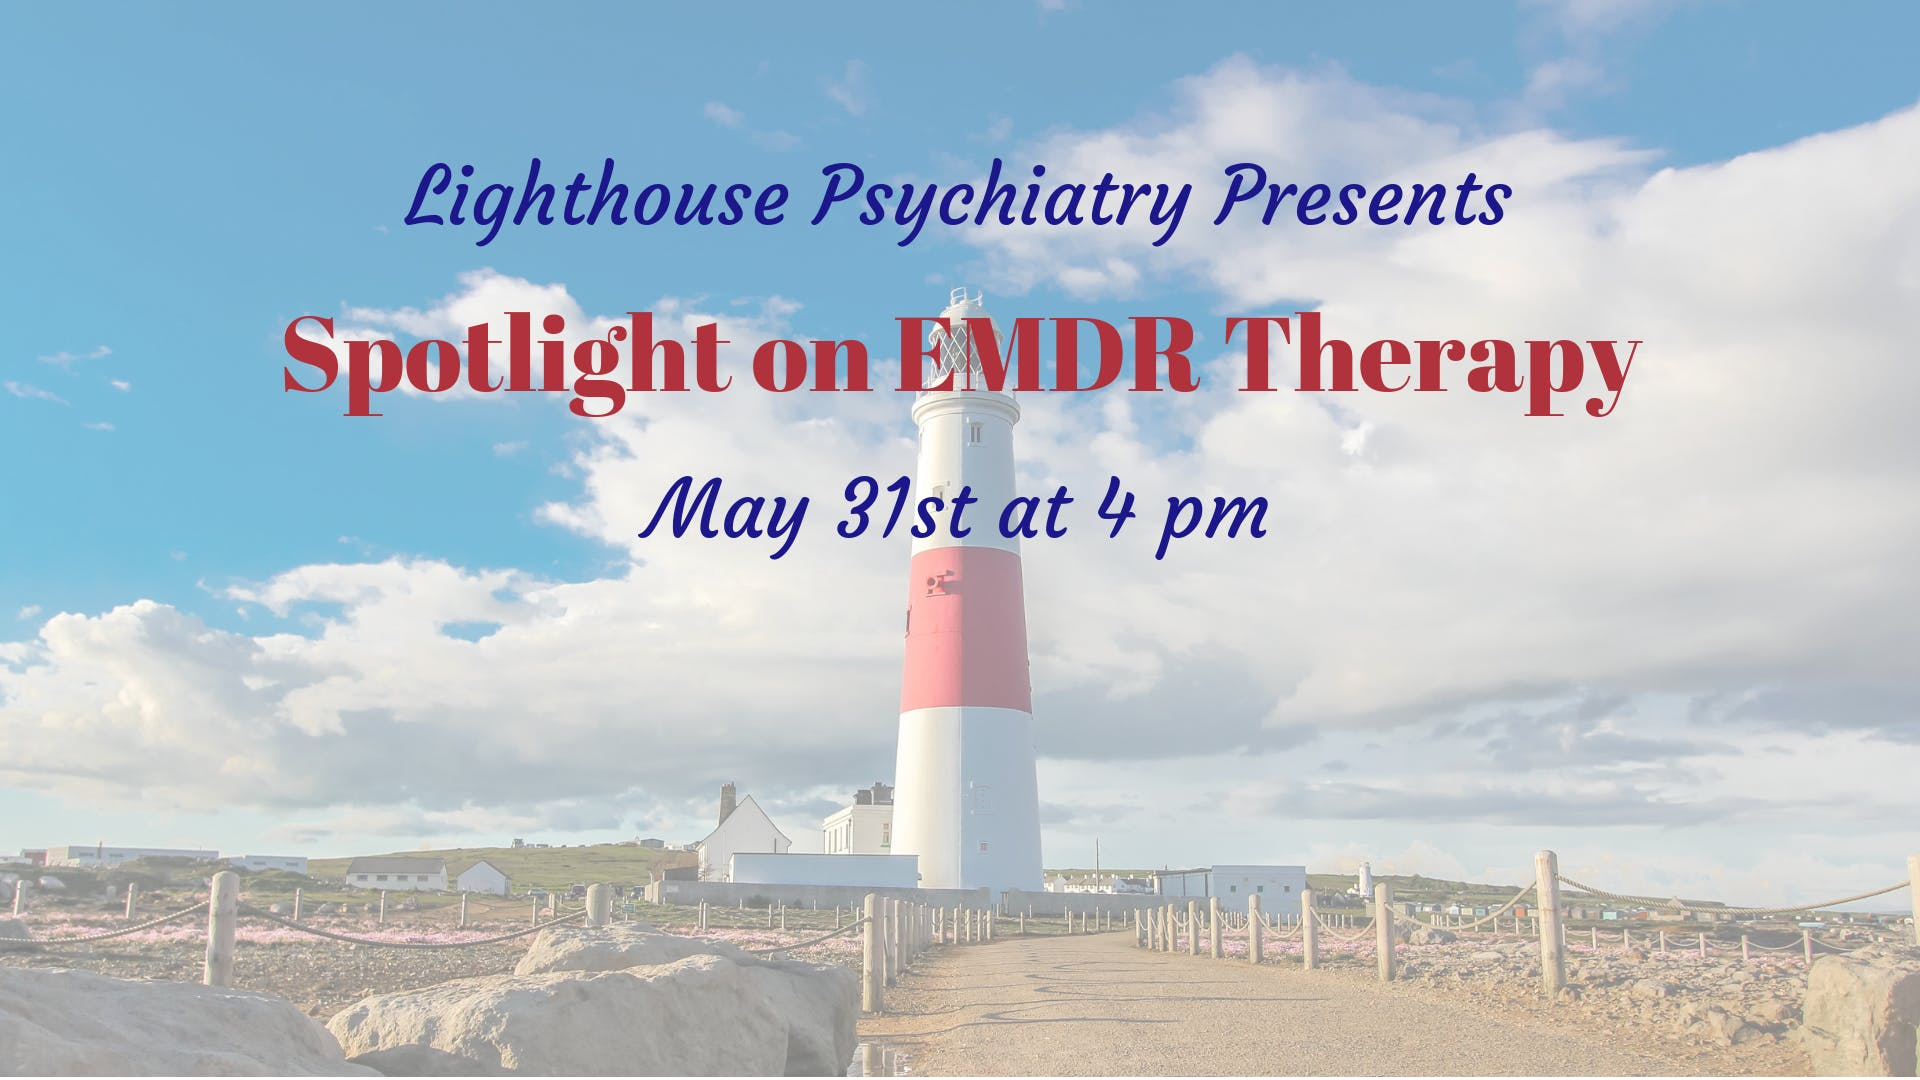 Spotlight on EMDR Therapy